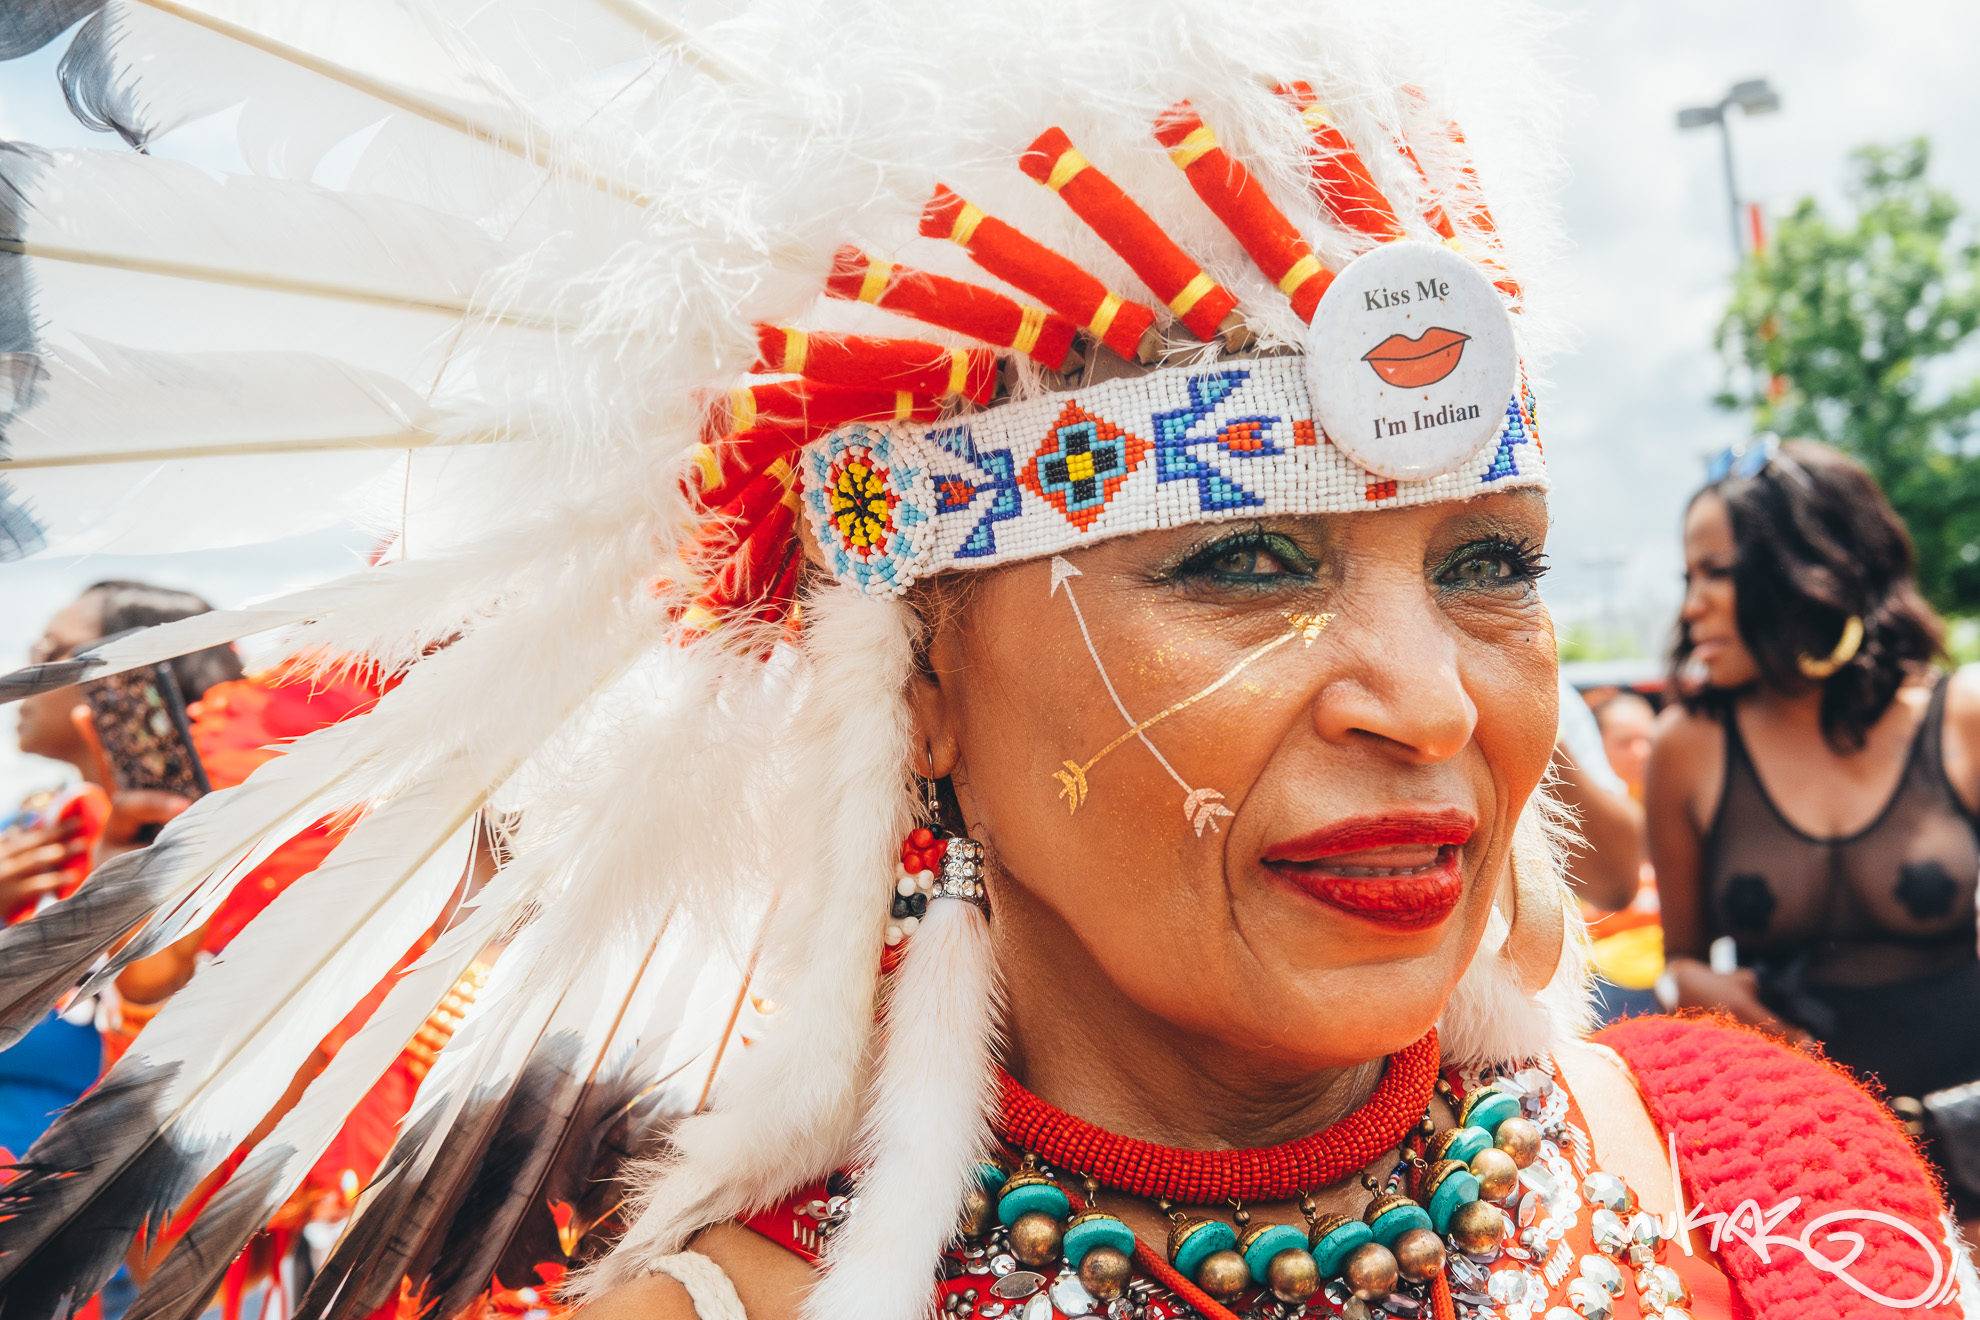 Atlanta Dekalb Carnival 2018